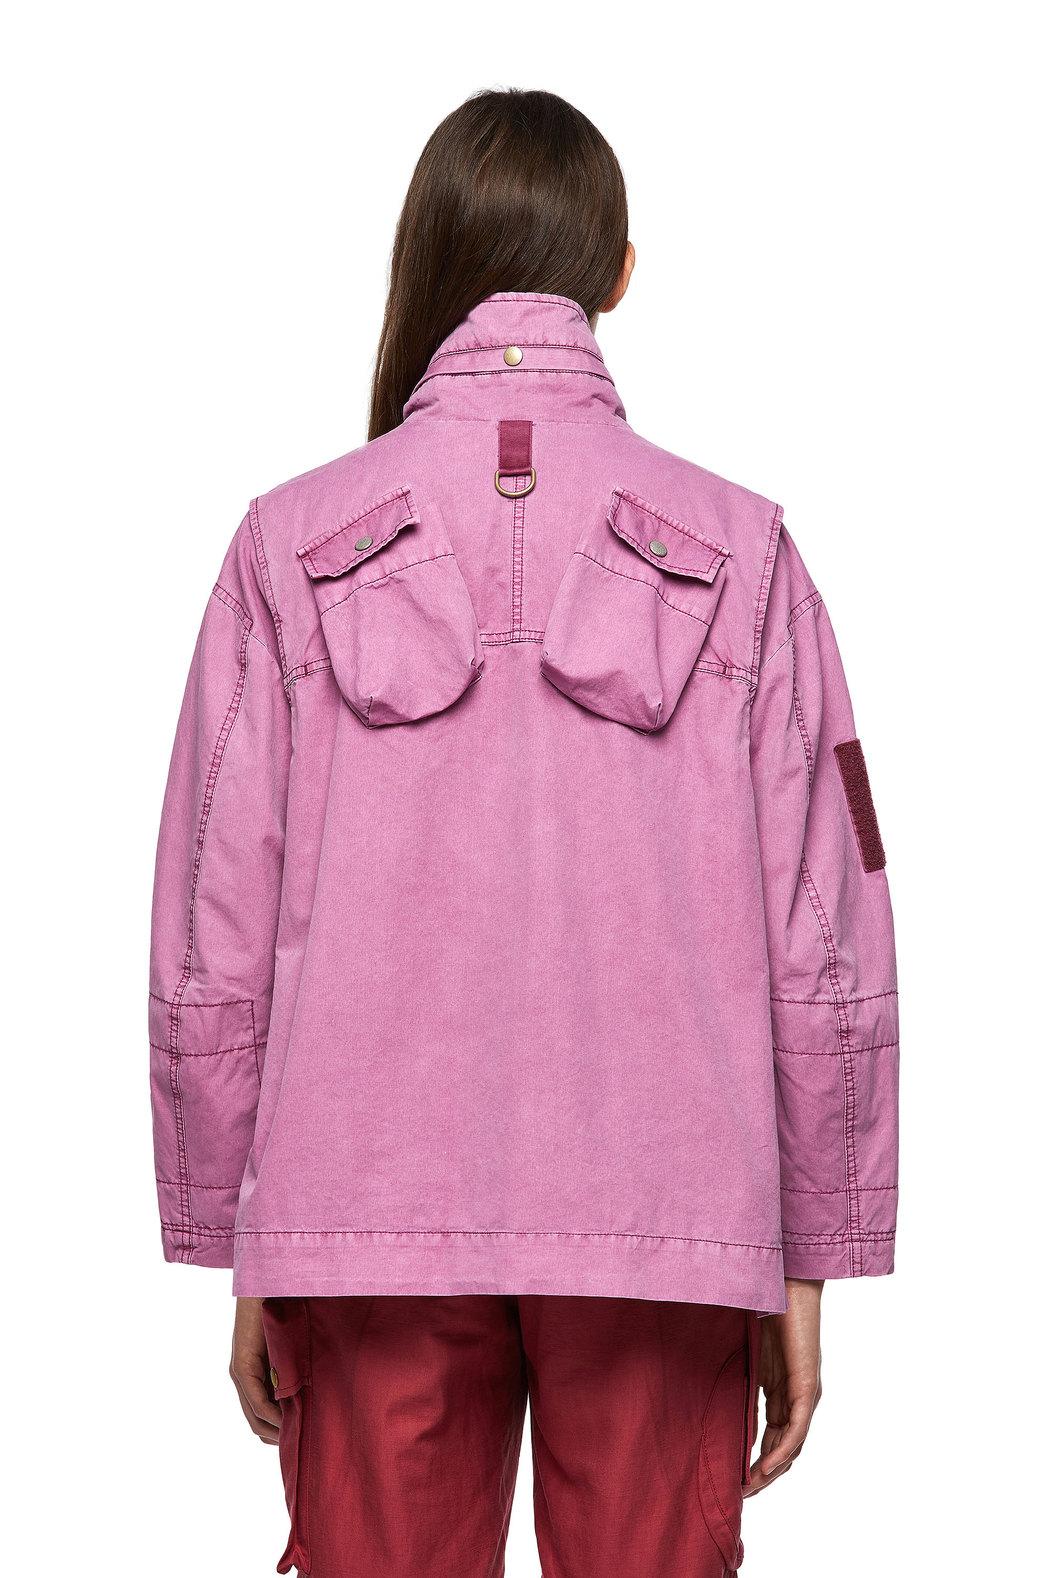 Garment-dyed field jacket